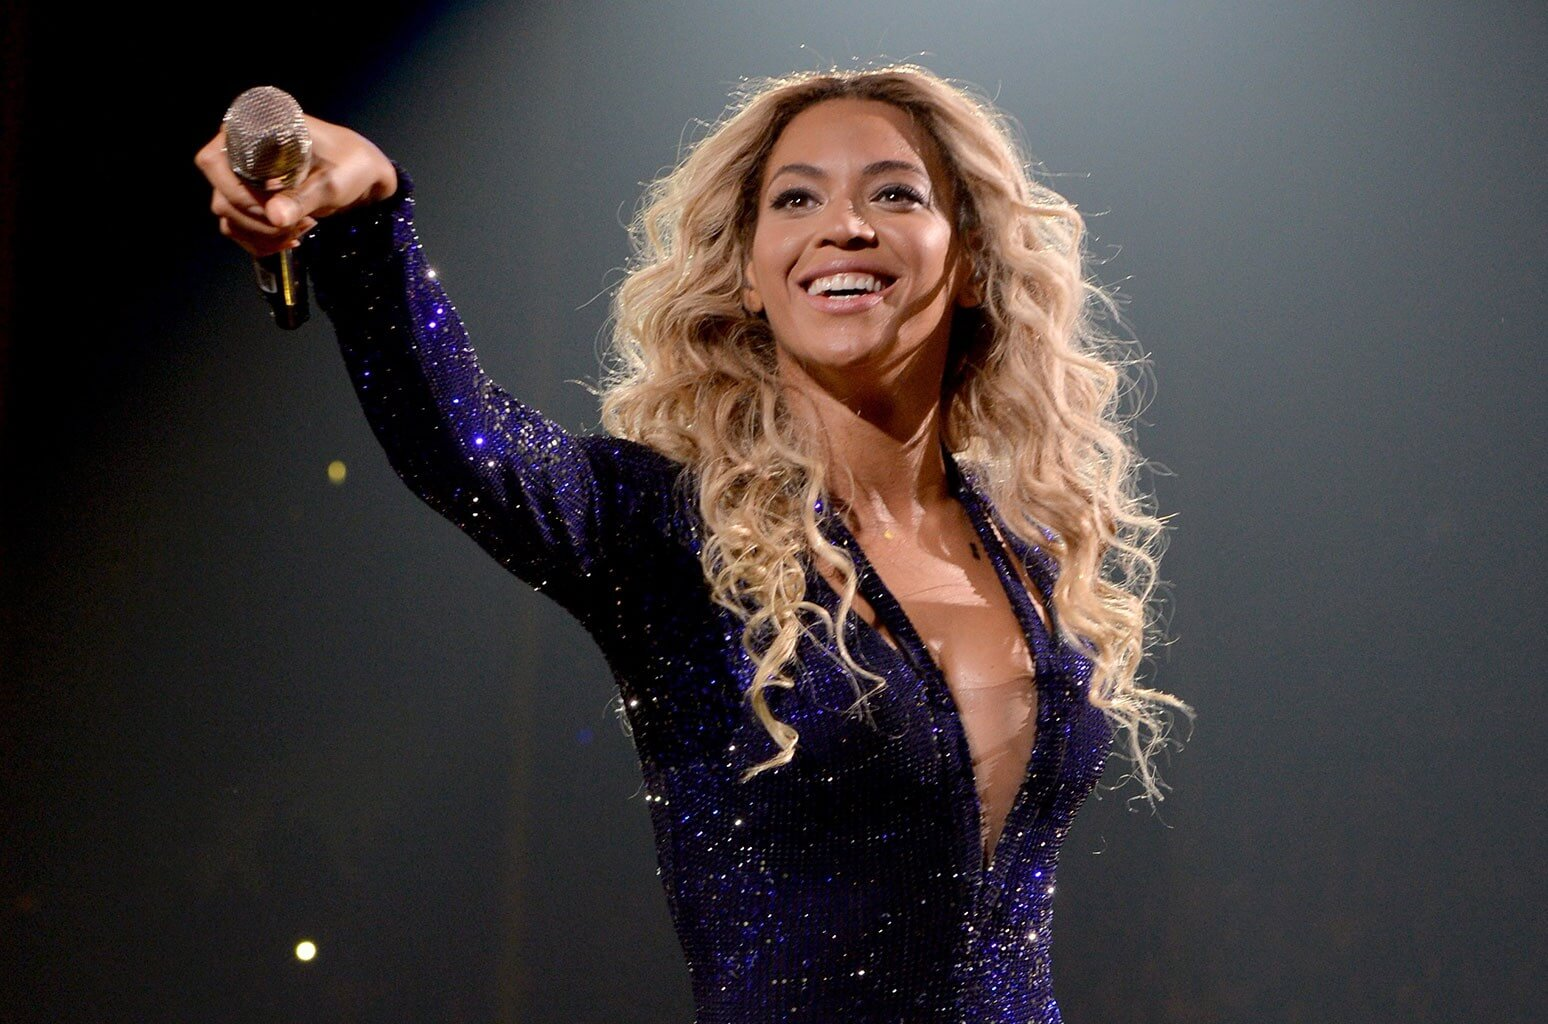 Beyoncéのアルバム売上ランキングトップ5とおすすめ全アルバムまとめ